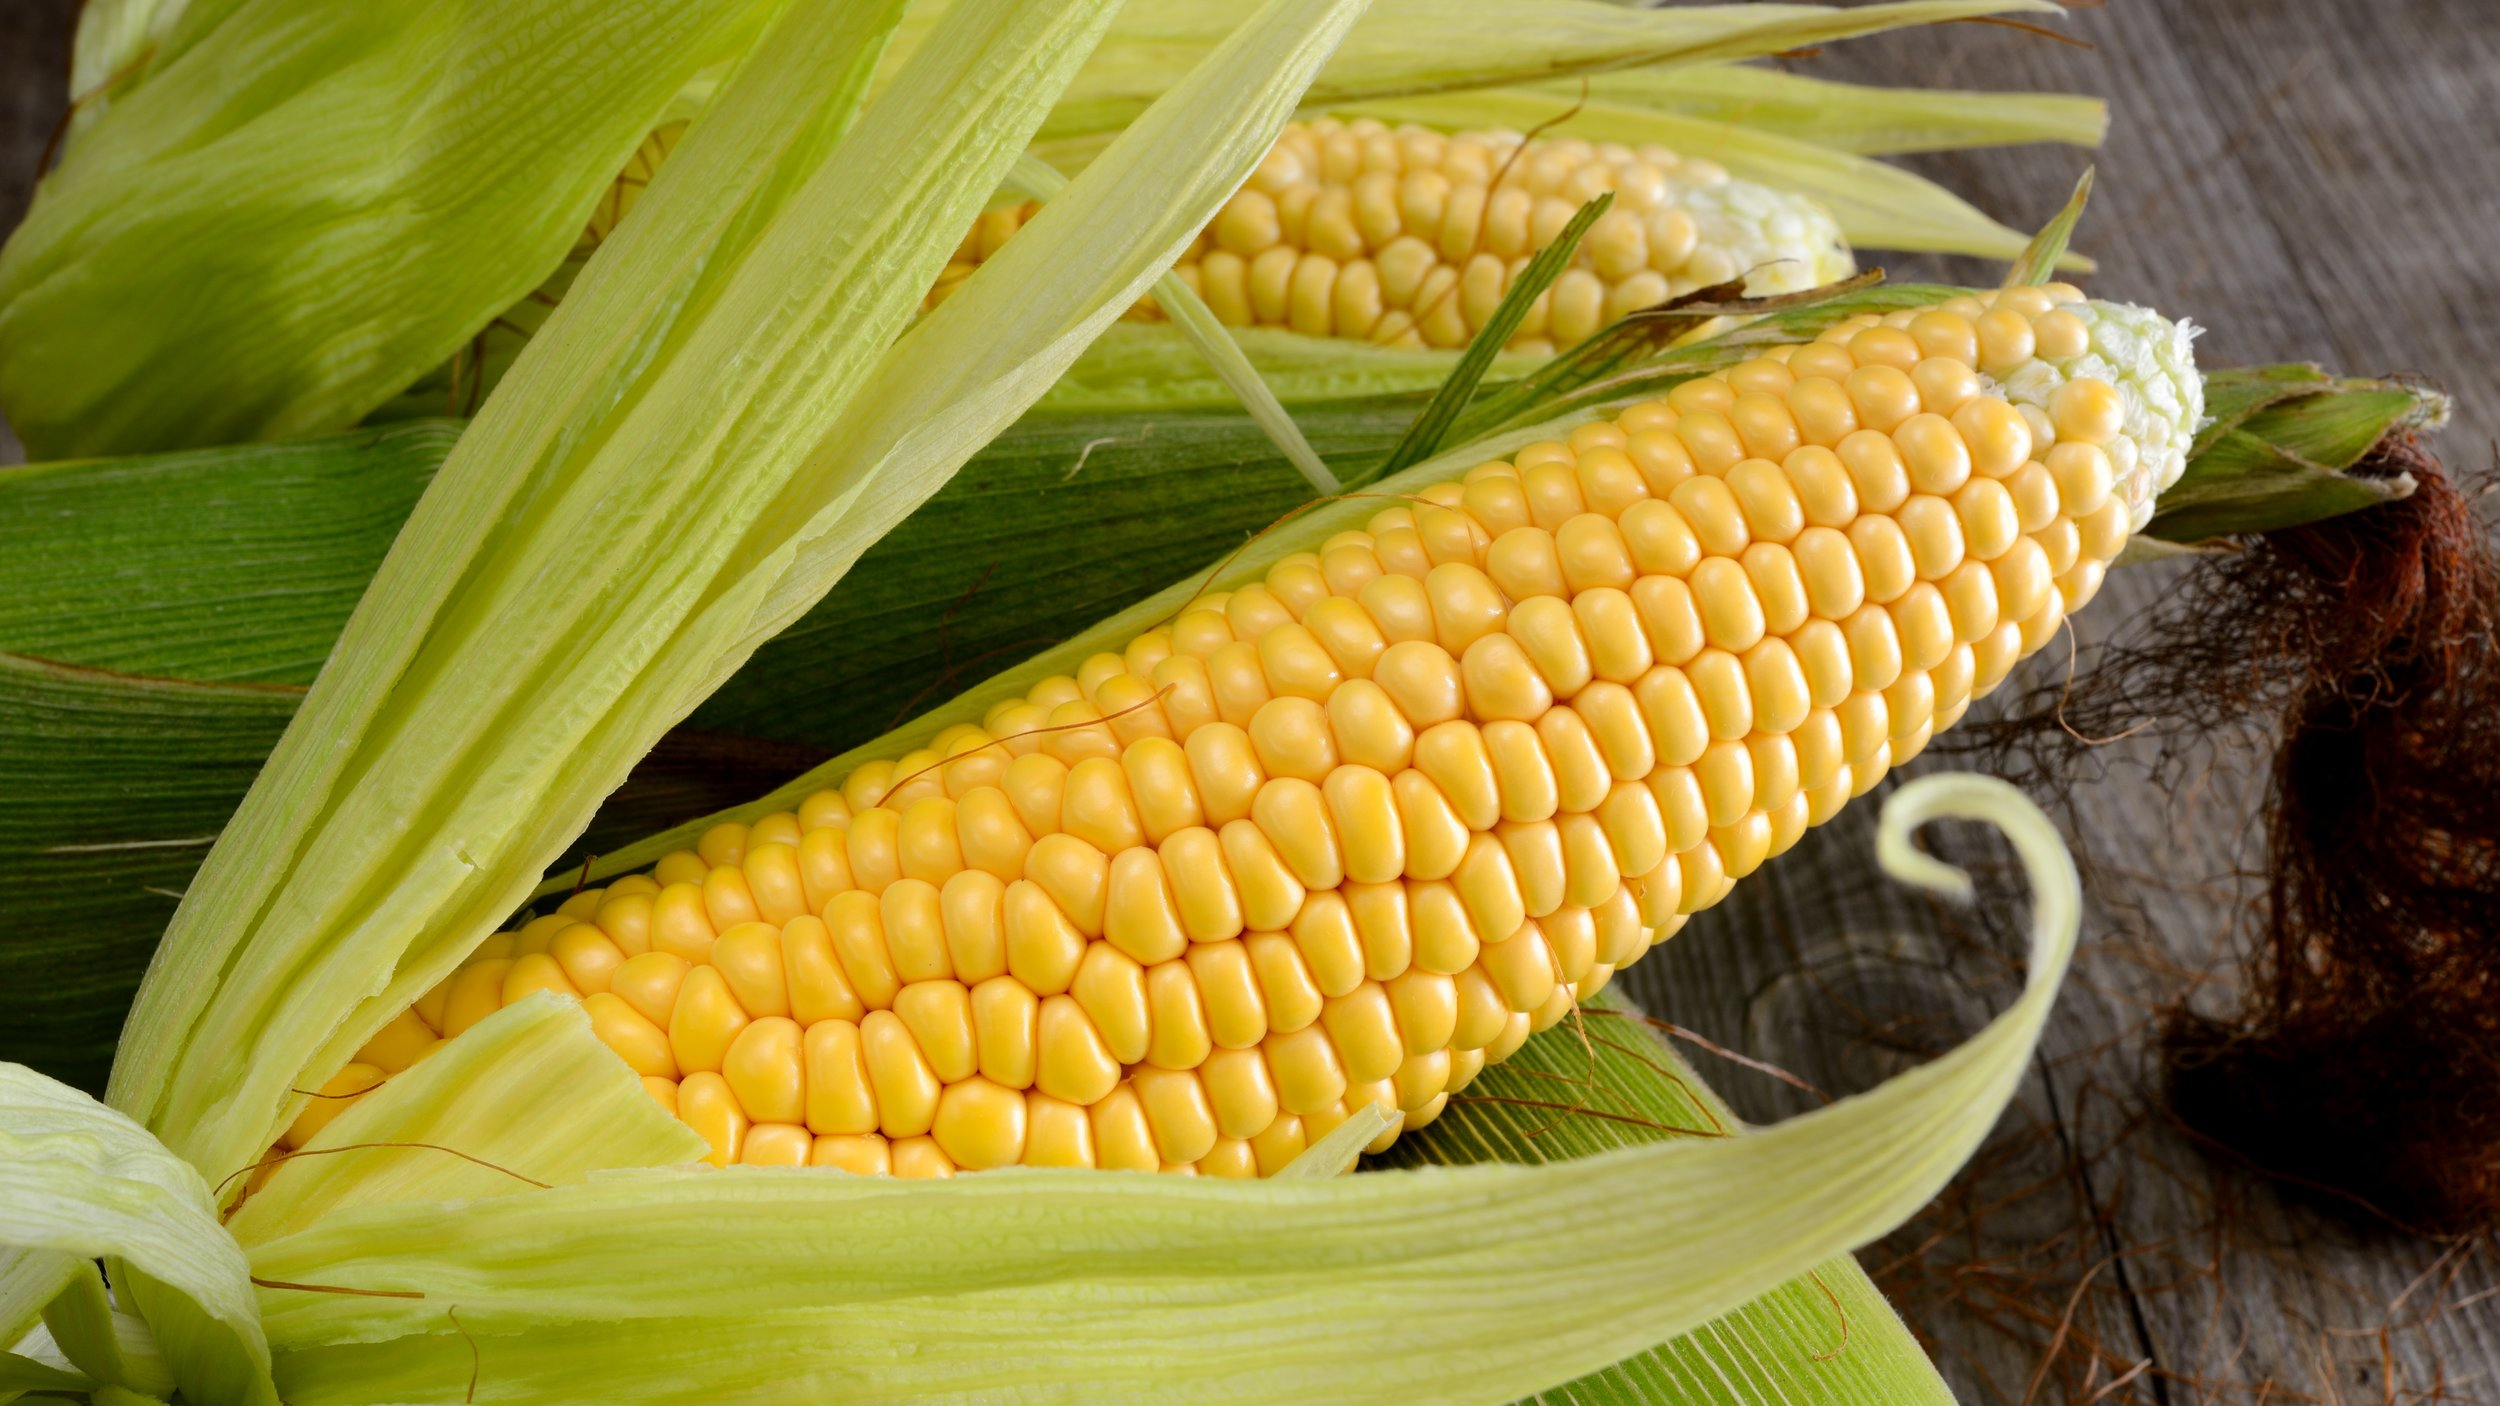 corn-cob-PM729H8.jpg